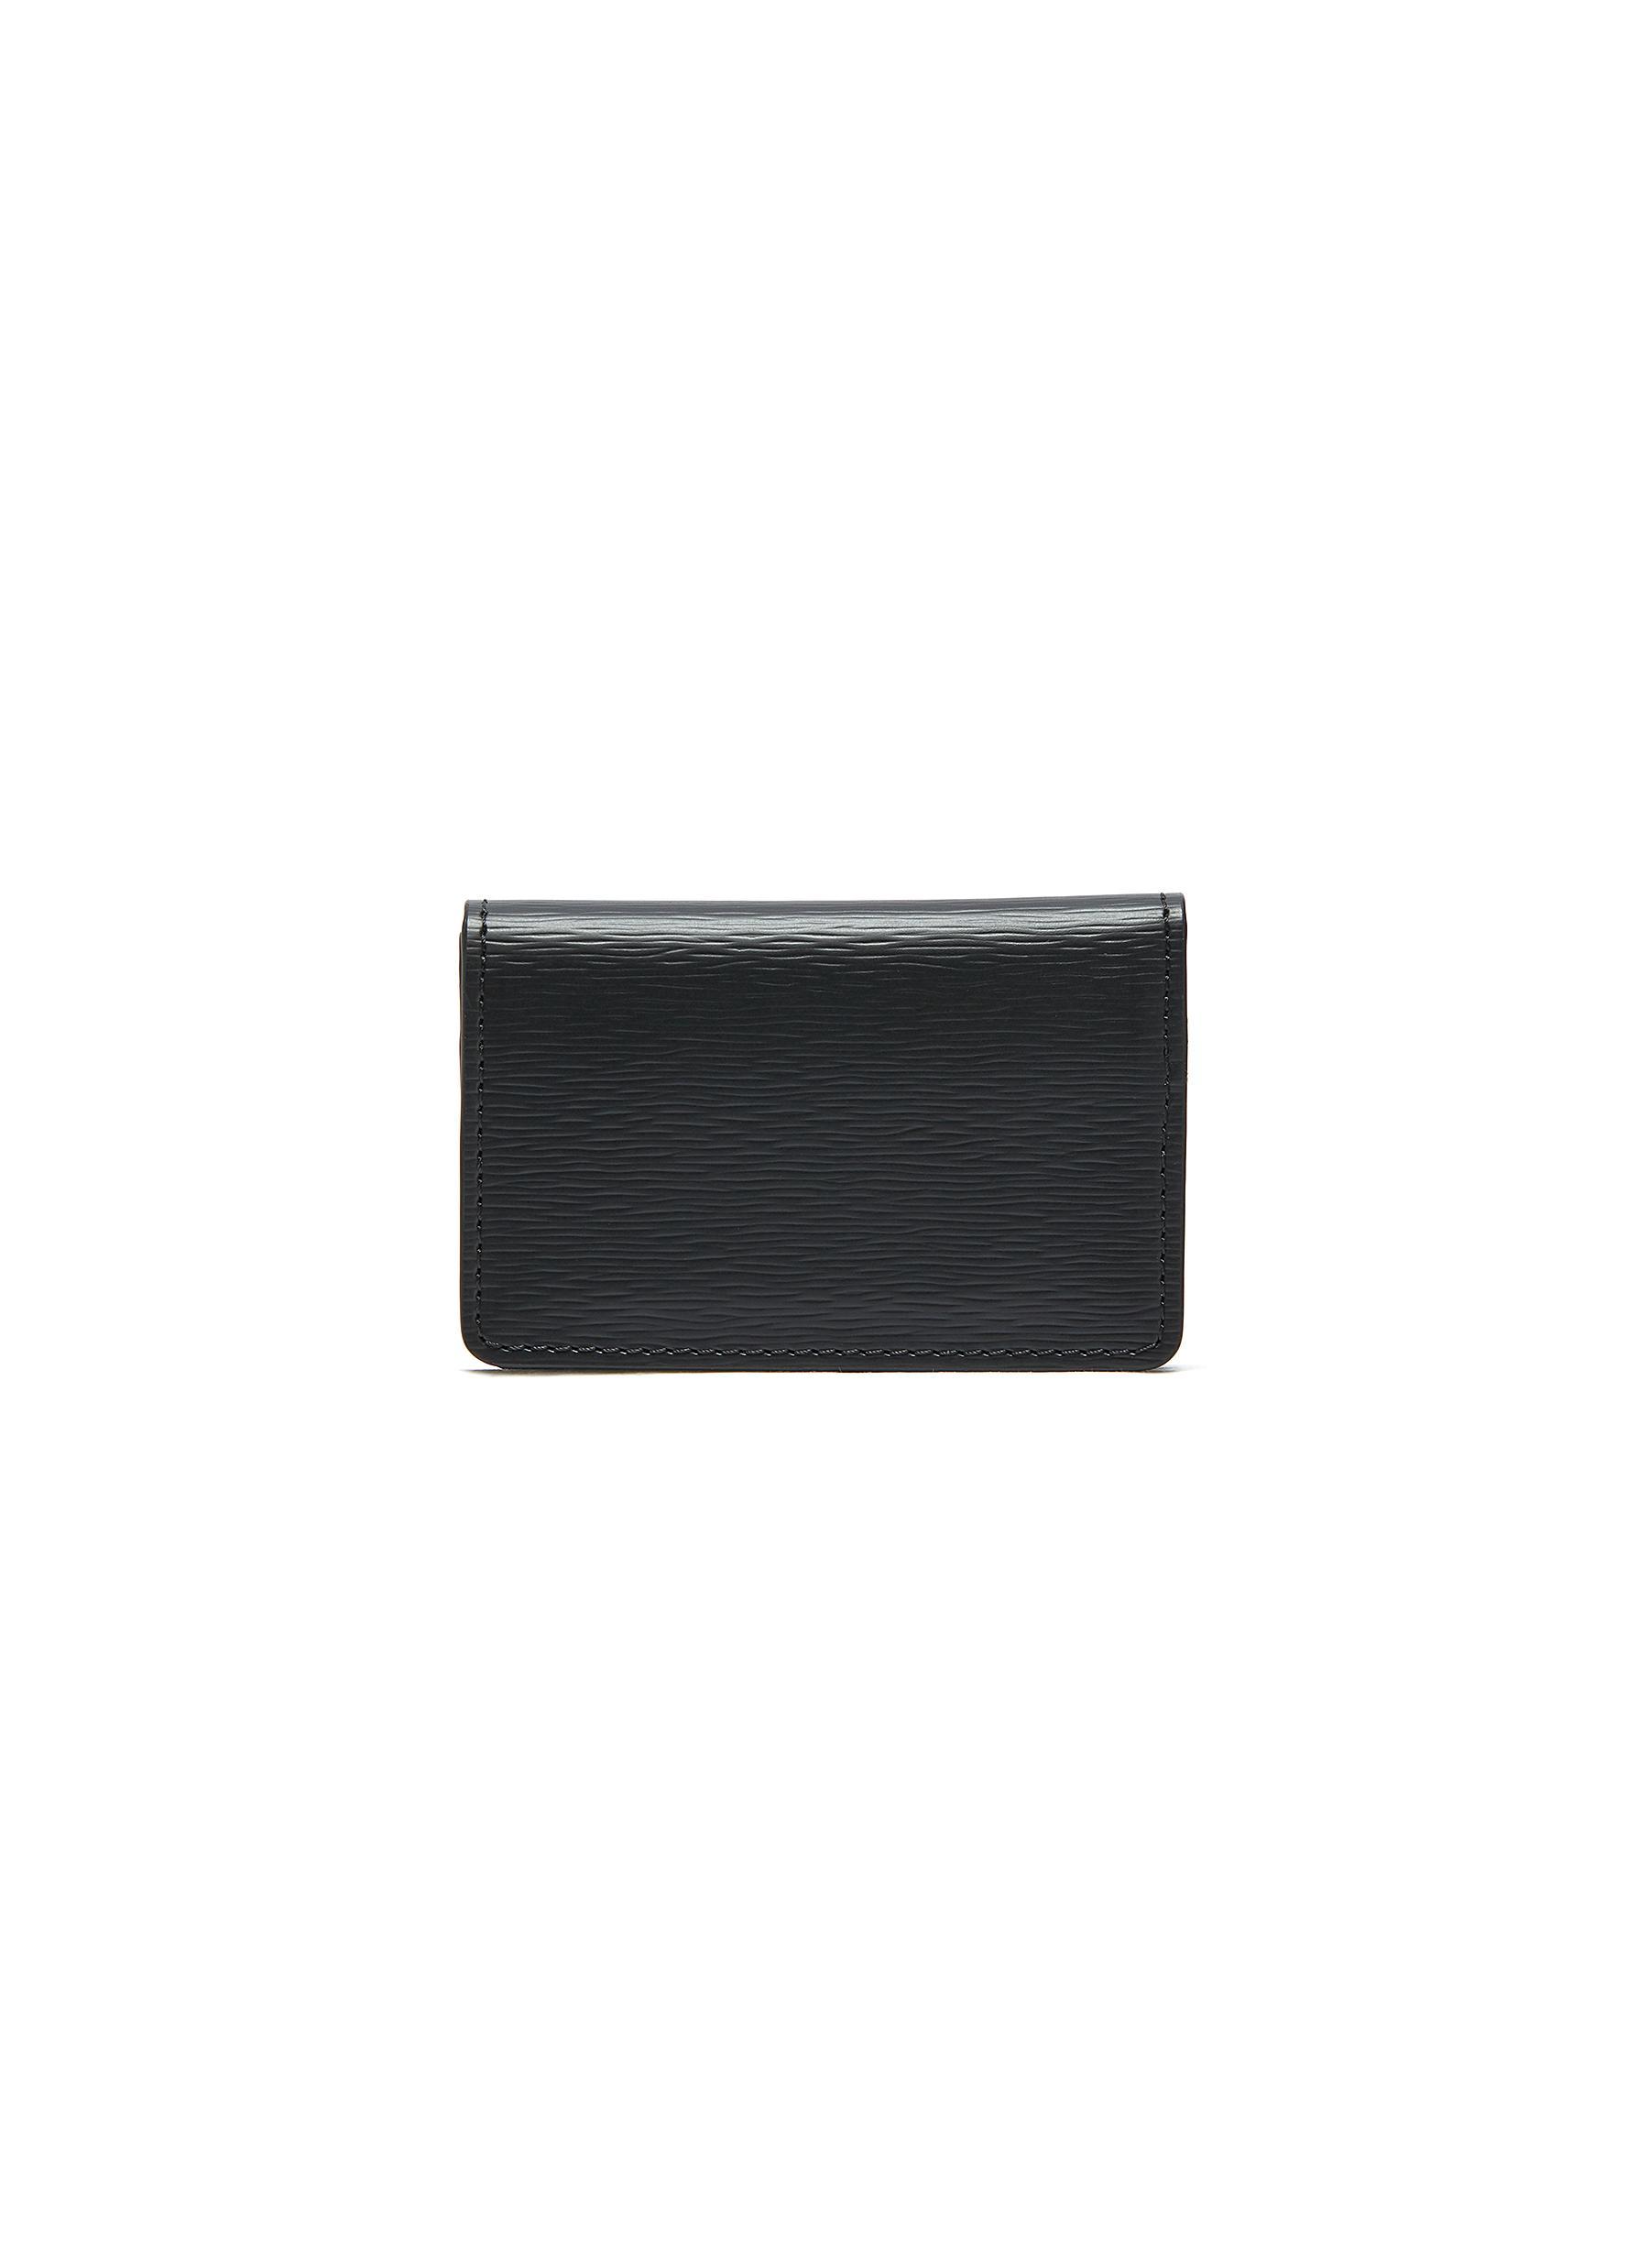 Embossed calfskin leather business cardholder